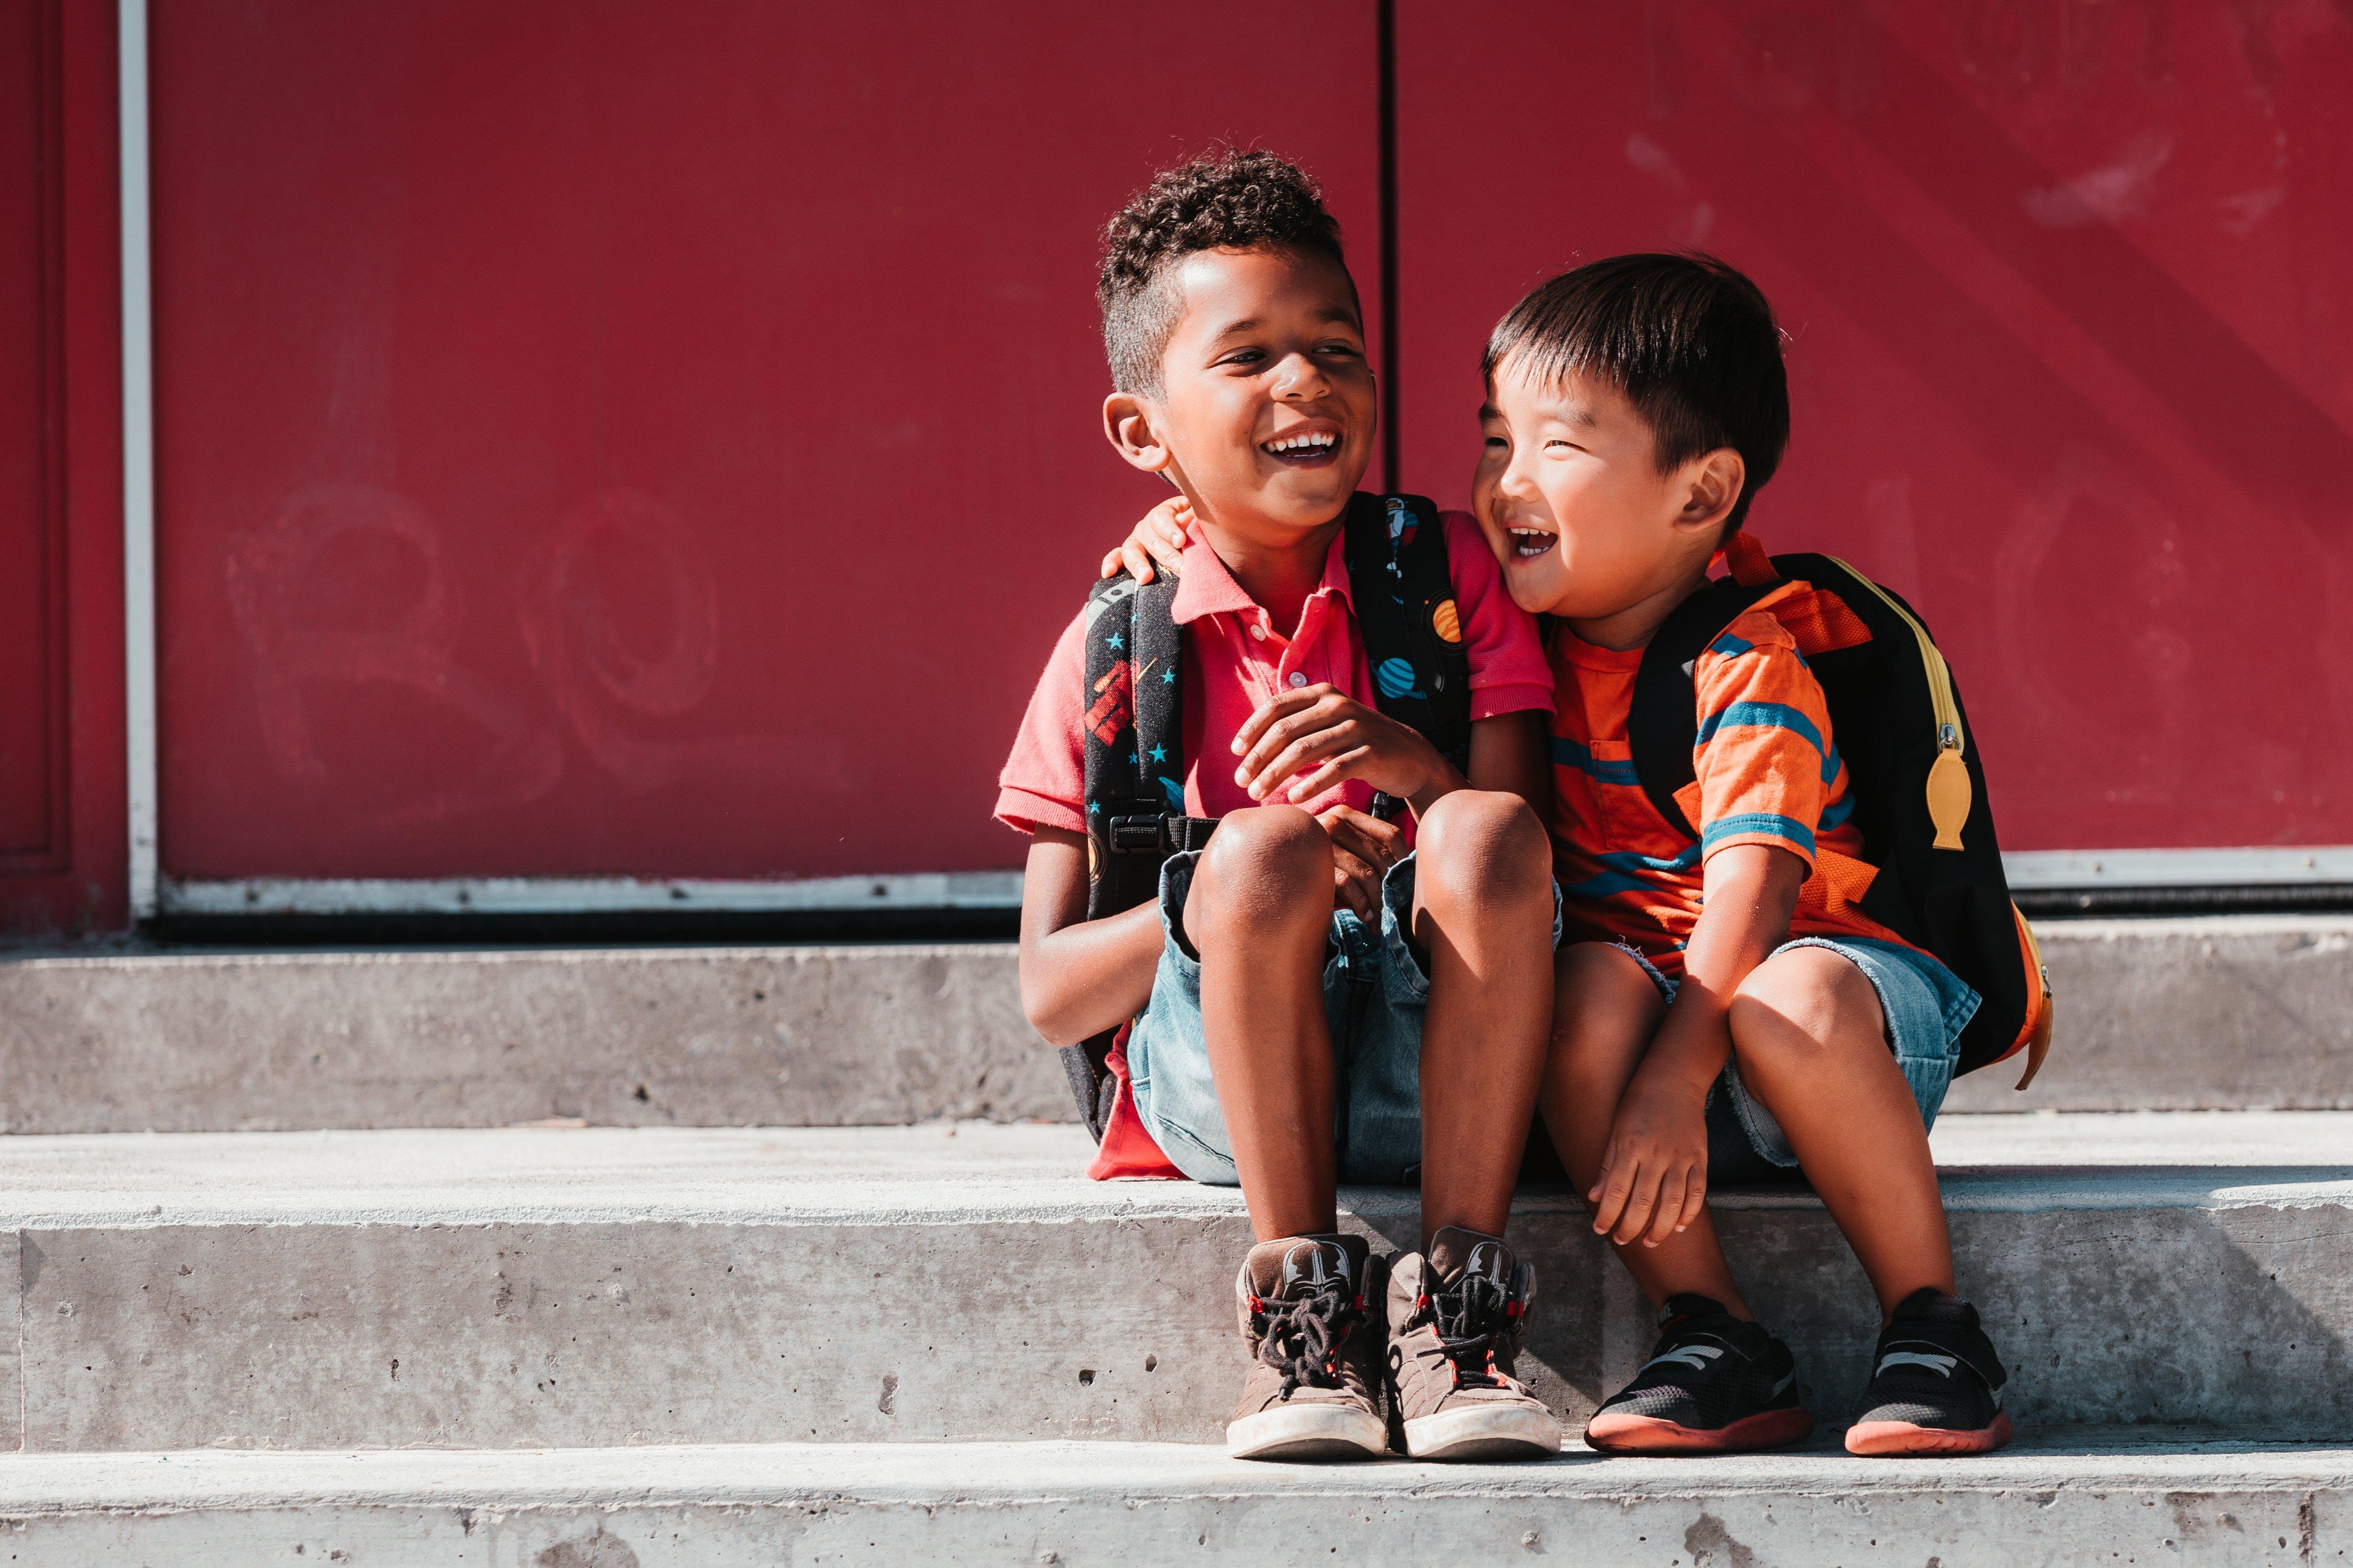 Kids giggle on steps